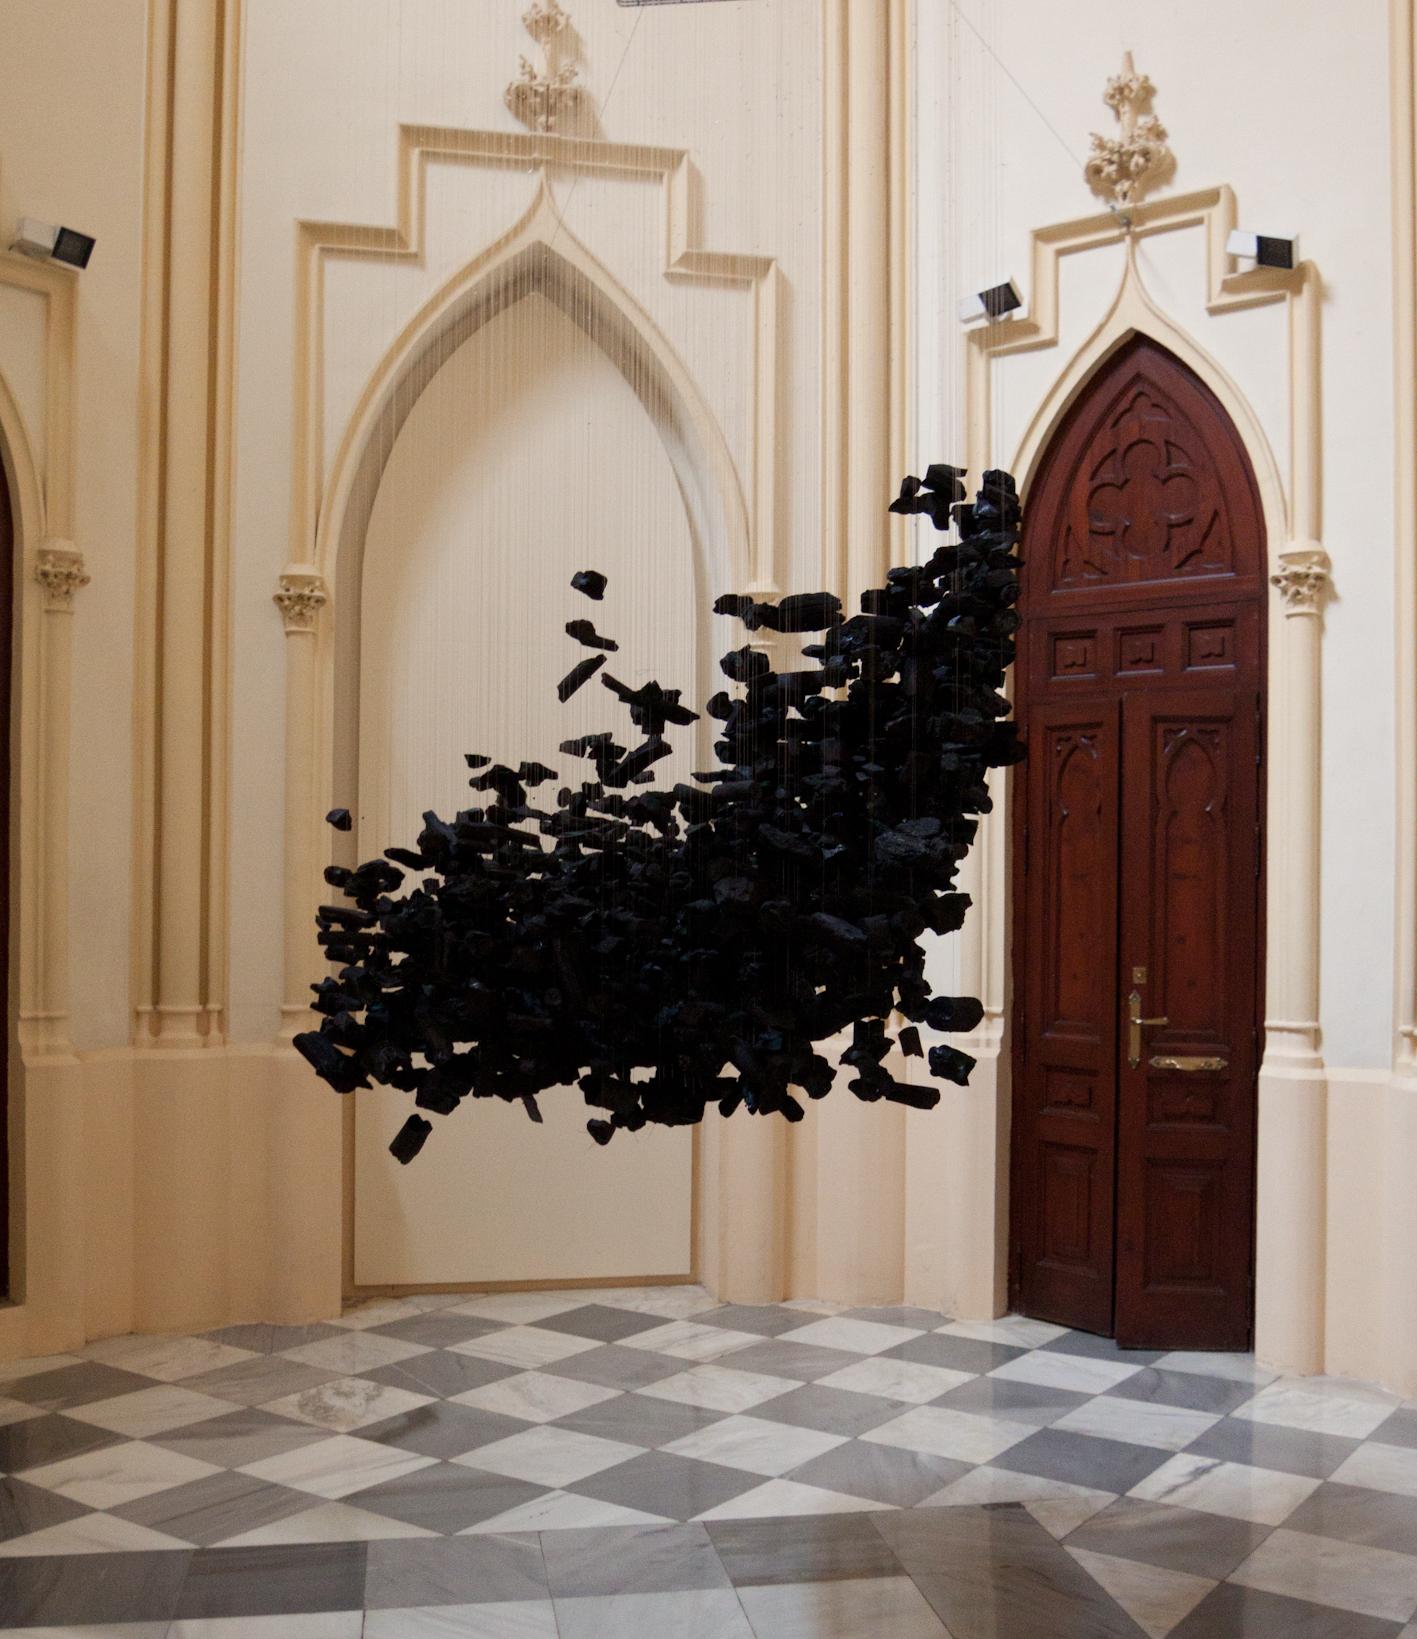 grabado, grafica expandida, negro, silencio, premio, capilla convalecencia, arte contemporáneo